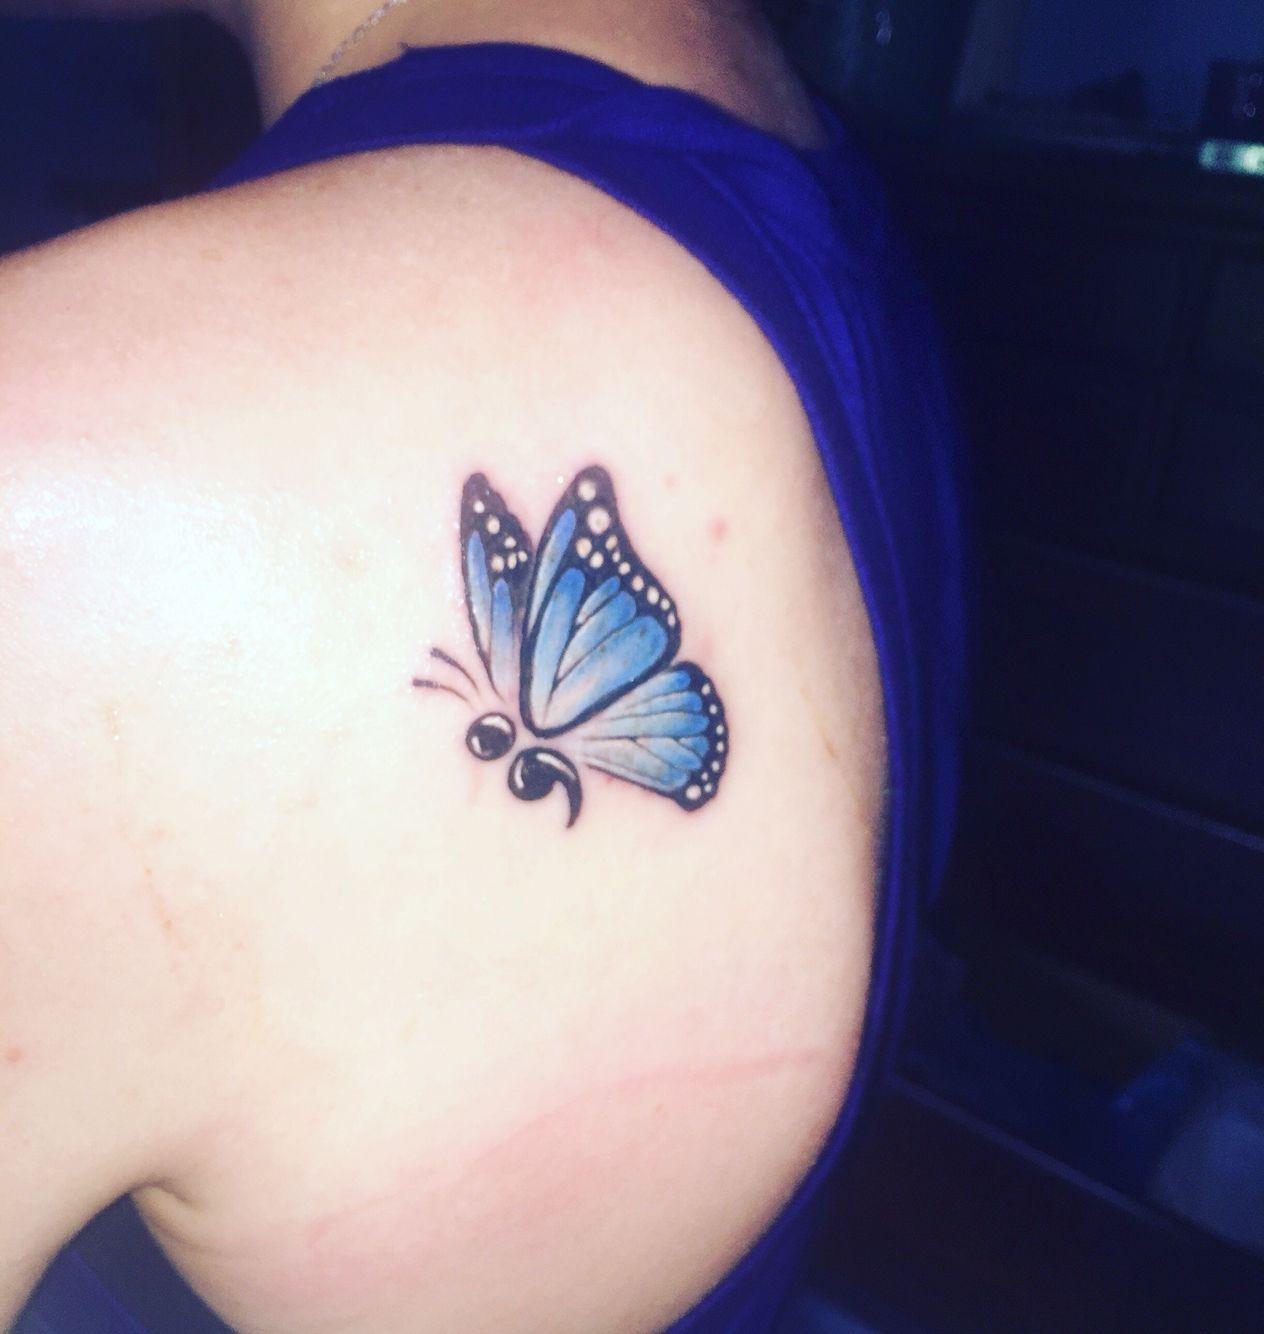 semicolon butterfly tattoo photos pinterest semicolon butterfly semicolon and butterfly. Black Bedroom Furniture Sets. Home Design Ideas